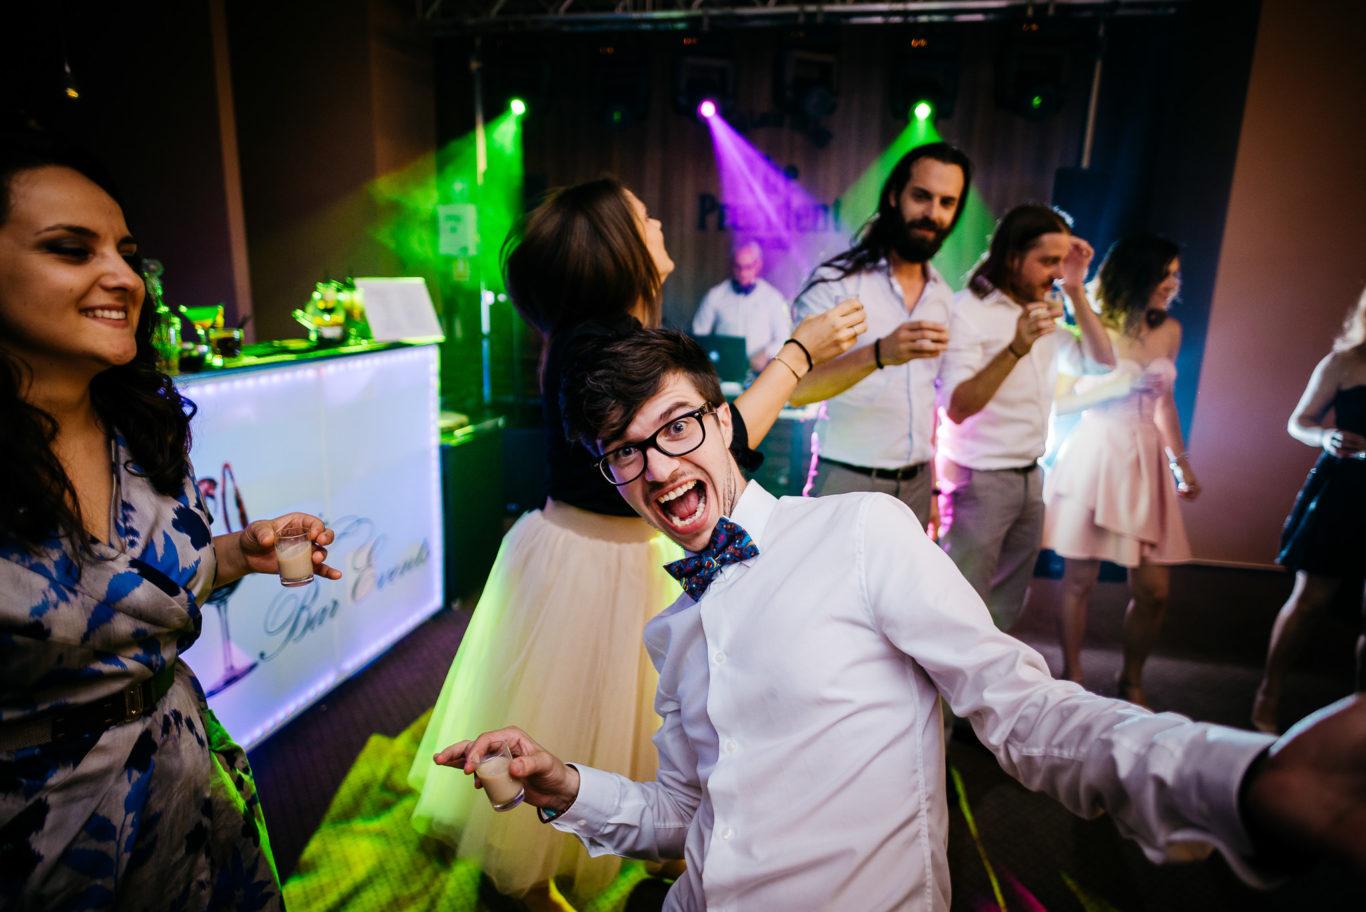 0923-Fotografie-nunta-Bucuresti-Oana-Catalin-fotograf-Ciprian-Dumitrescu-DSC_5956